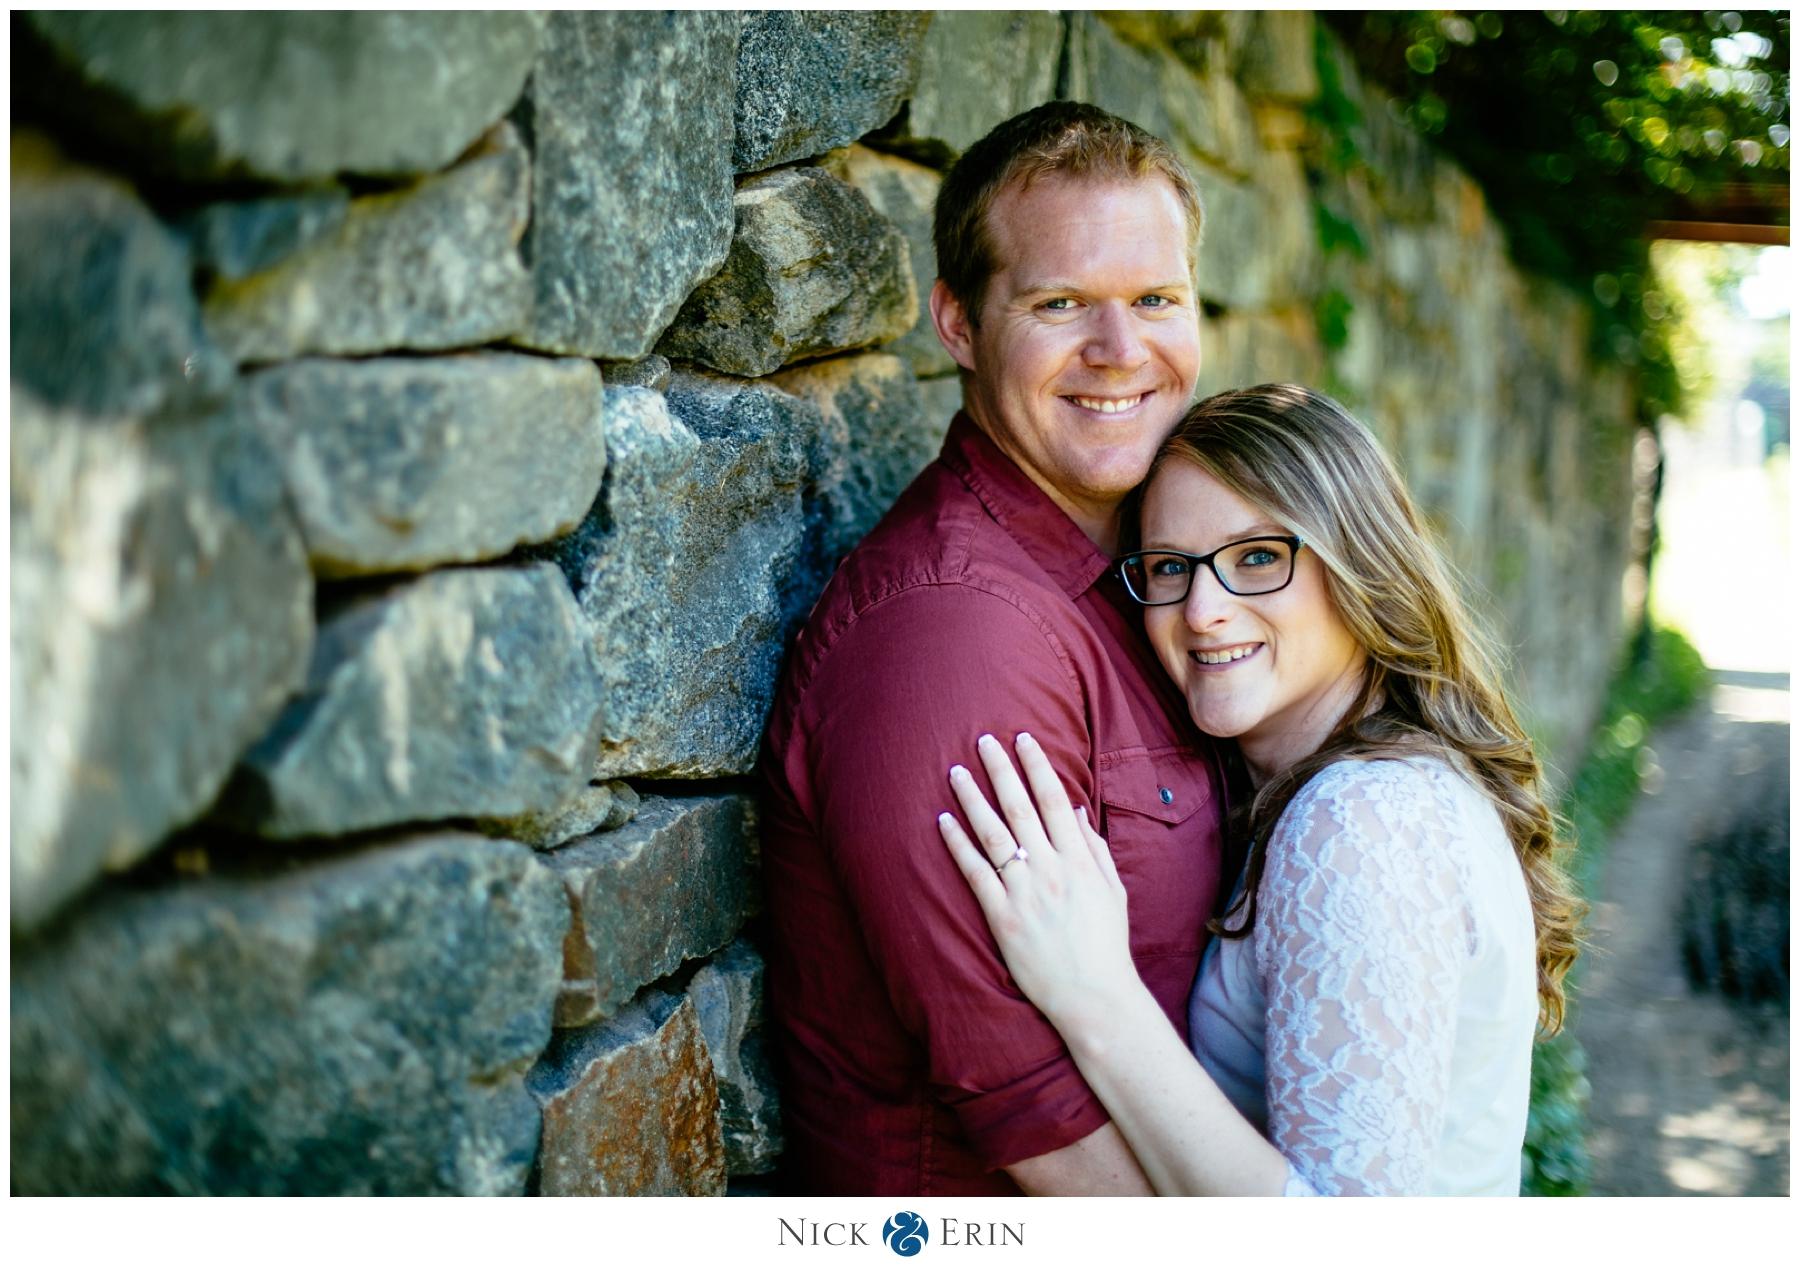 Donner_Photography_Washington DC Engagement_Katie & Chris_00019